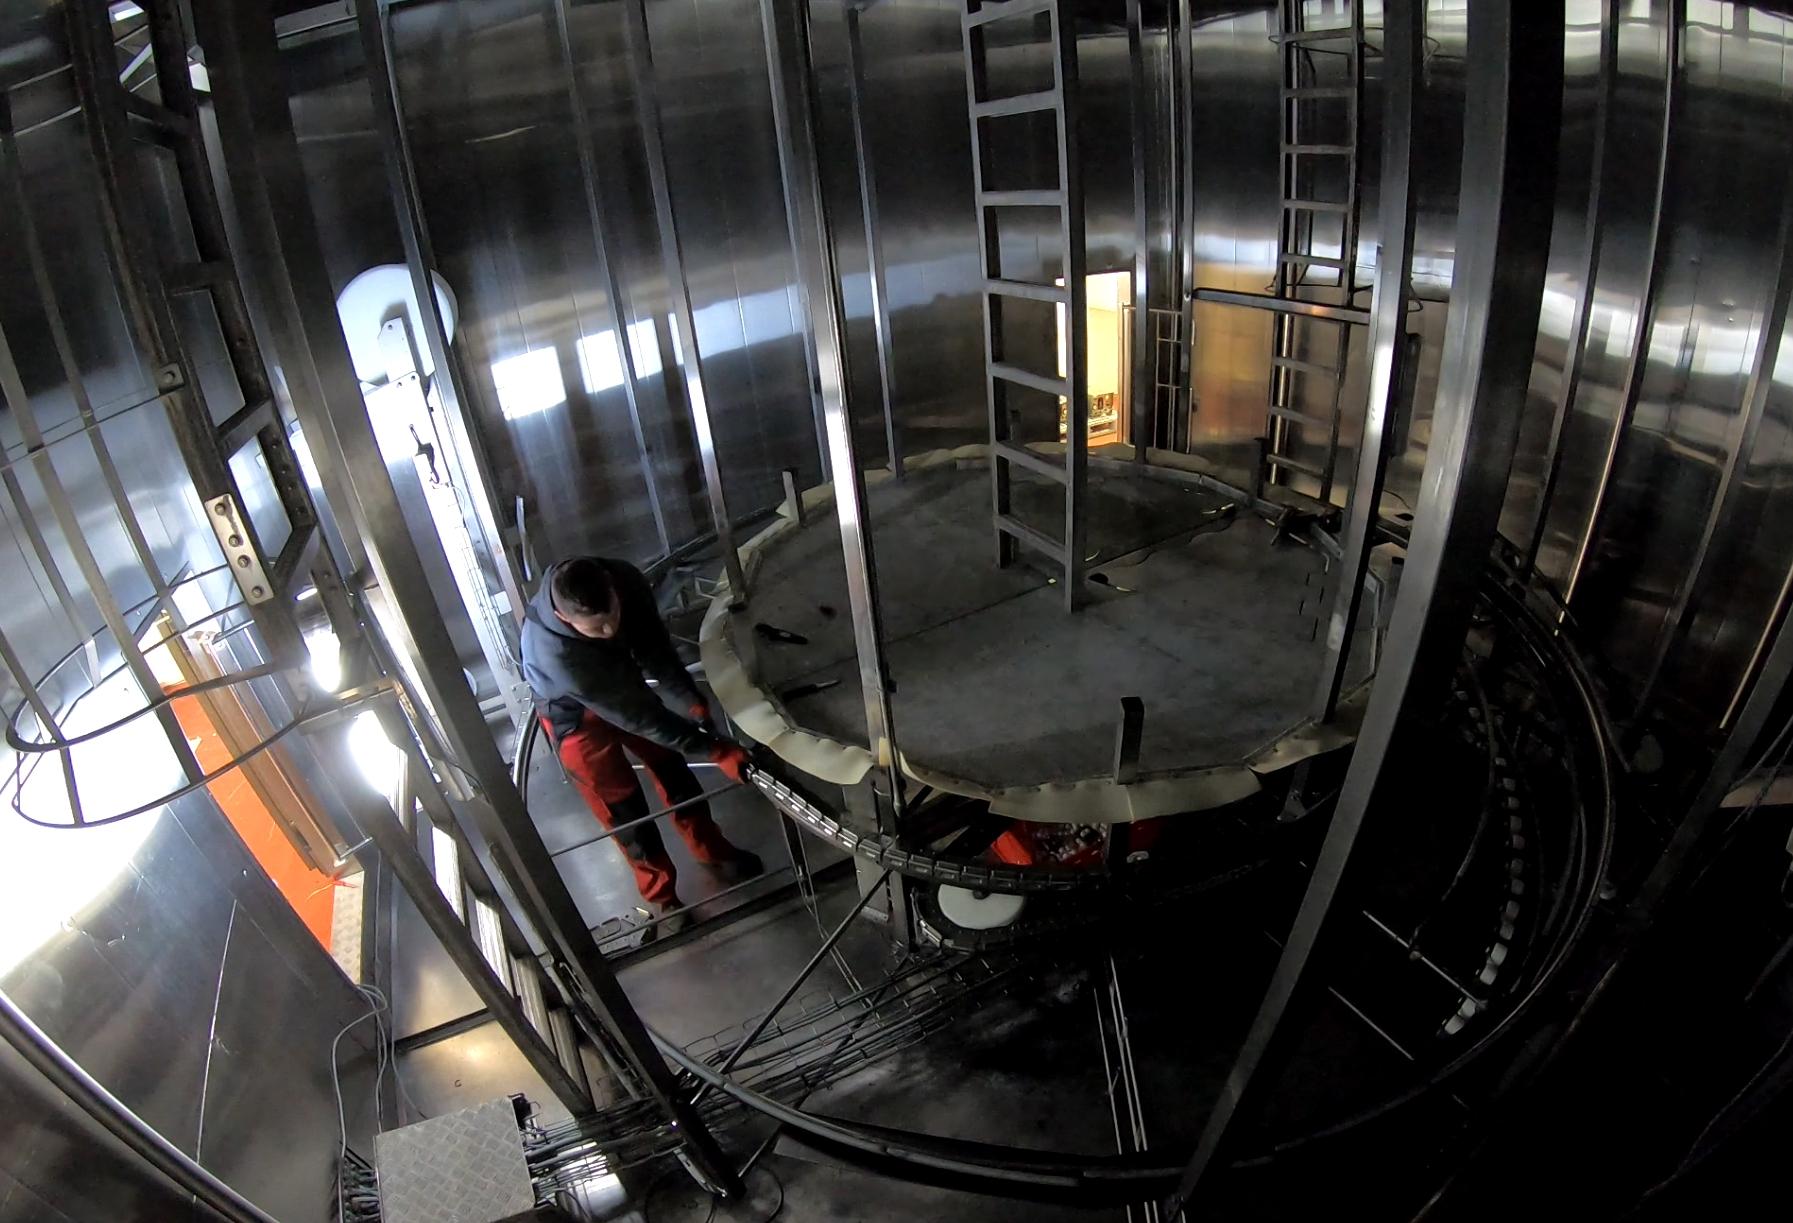 Dismantling Frigoscandia M7 Spiral Freezer in Germany